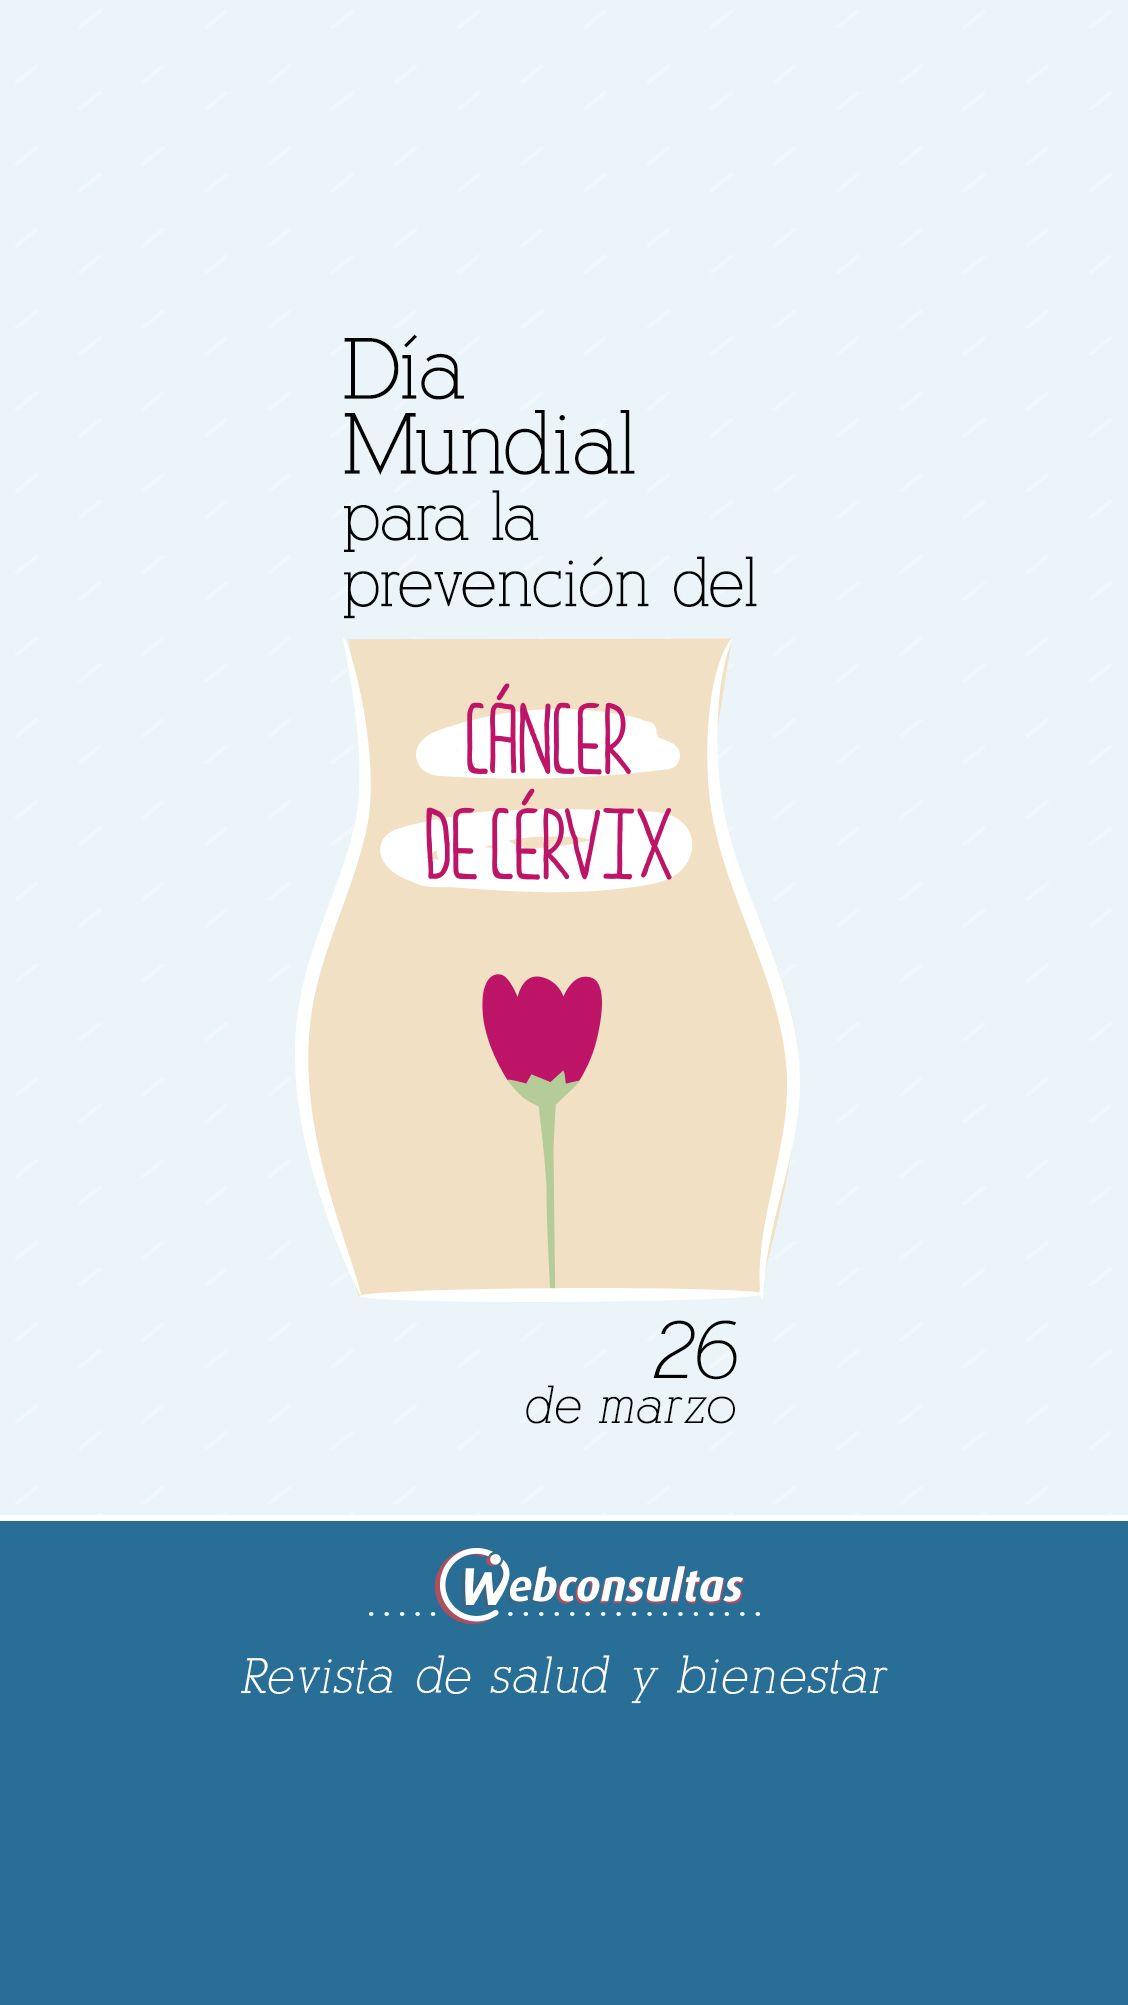 helmintox 125 mg comprime doare cancerul de san